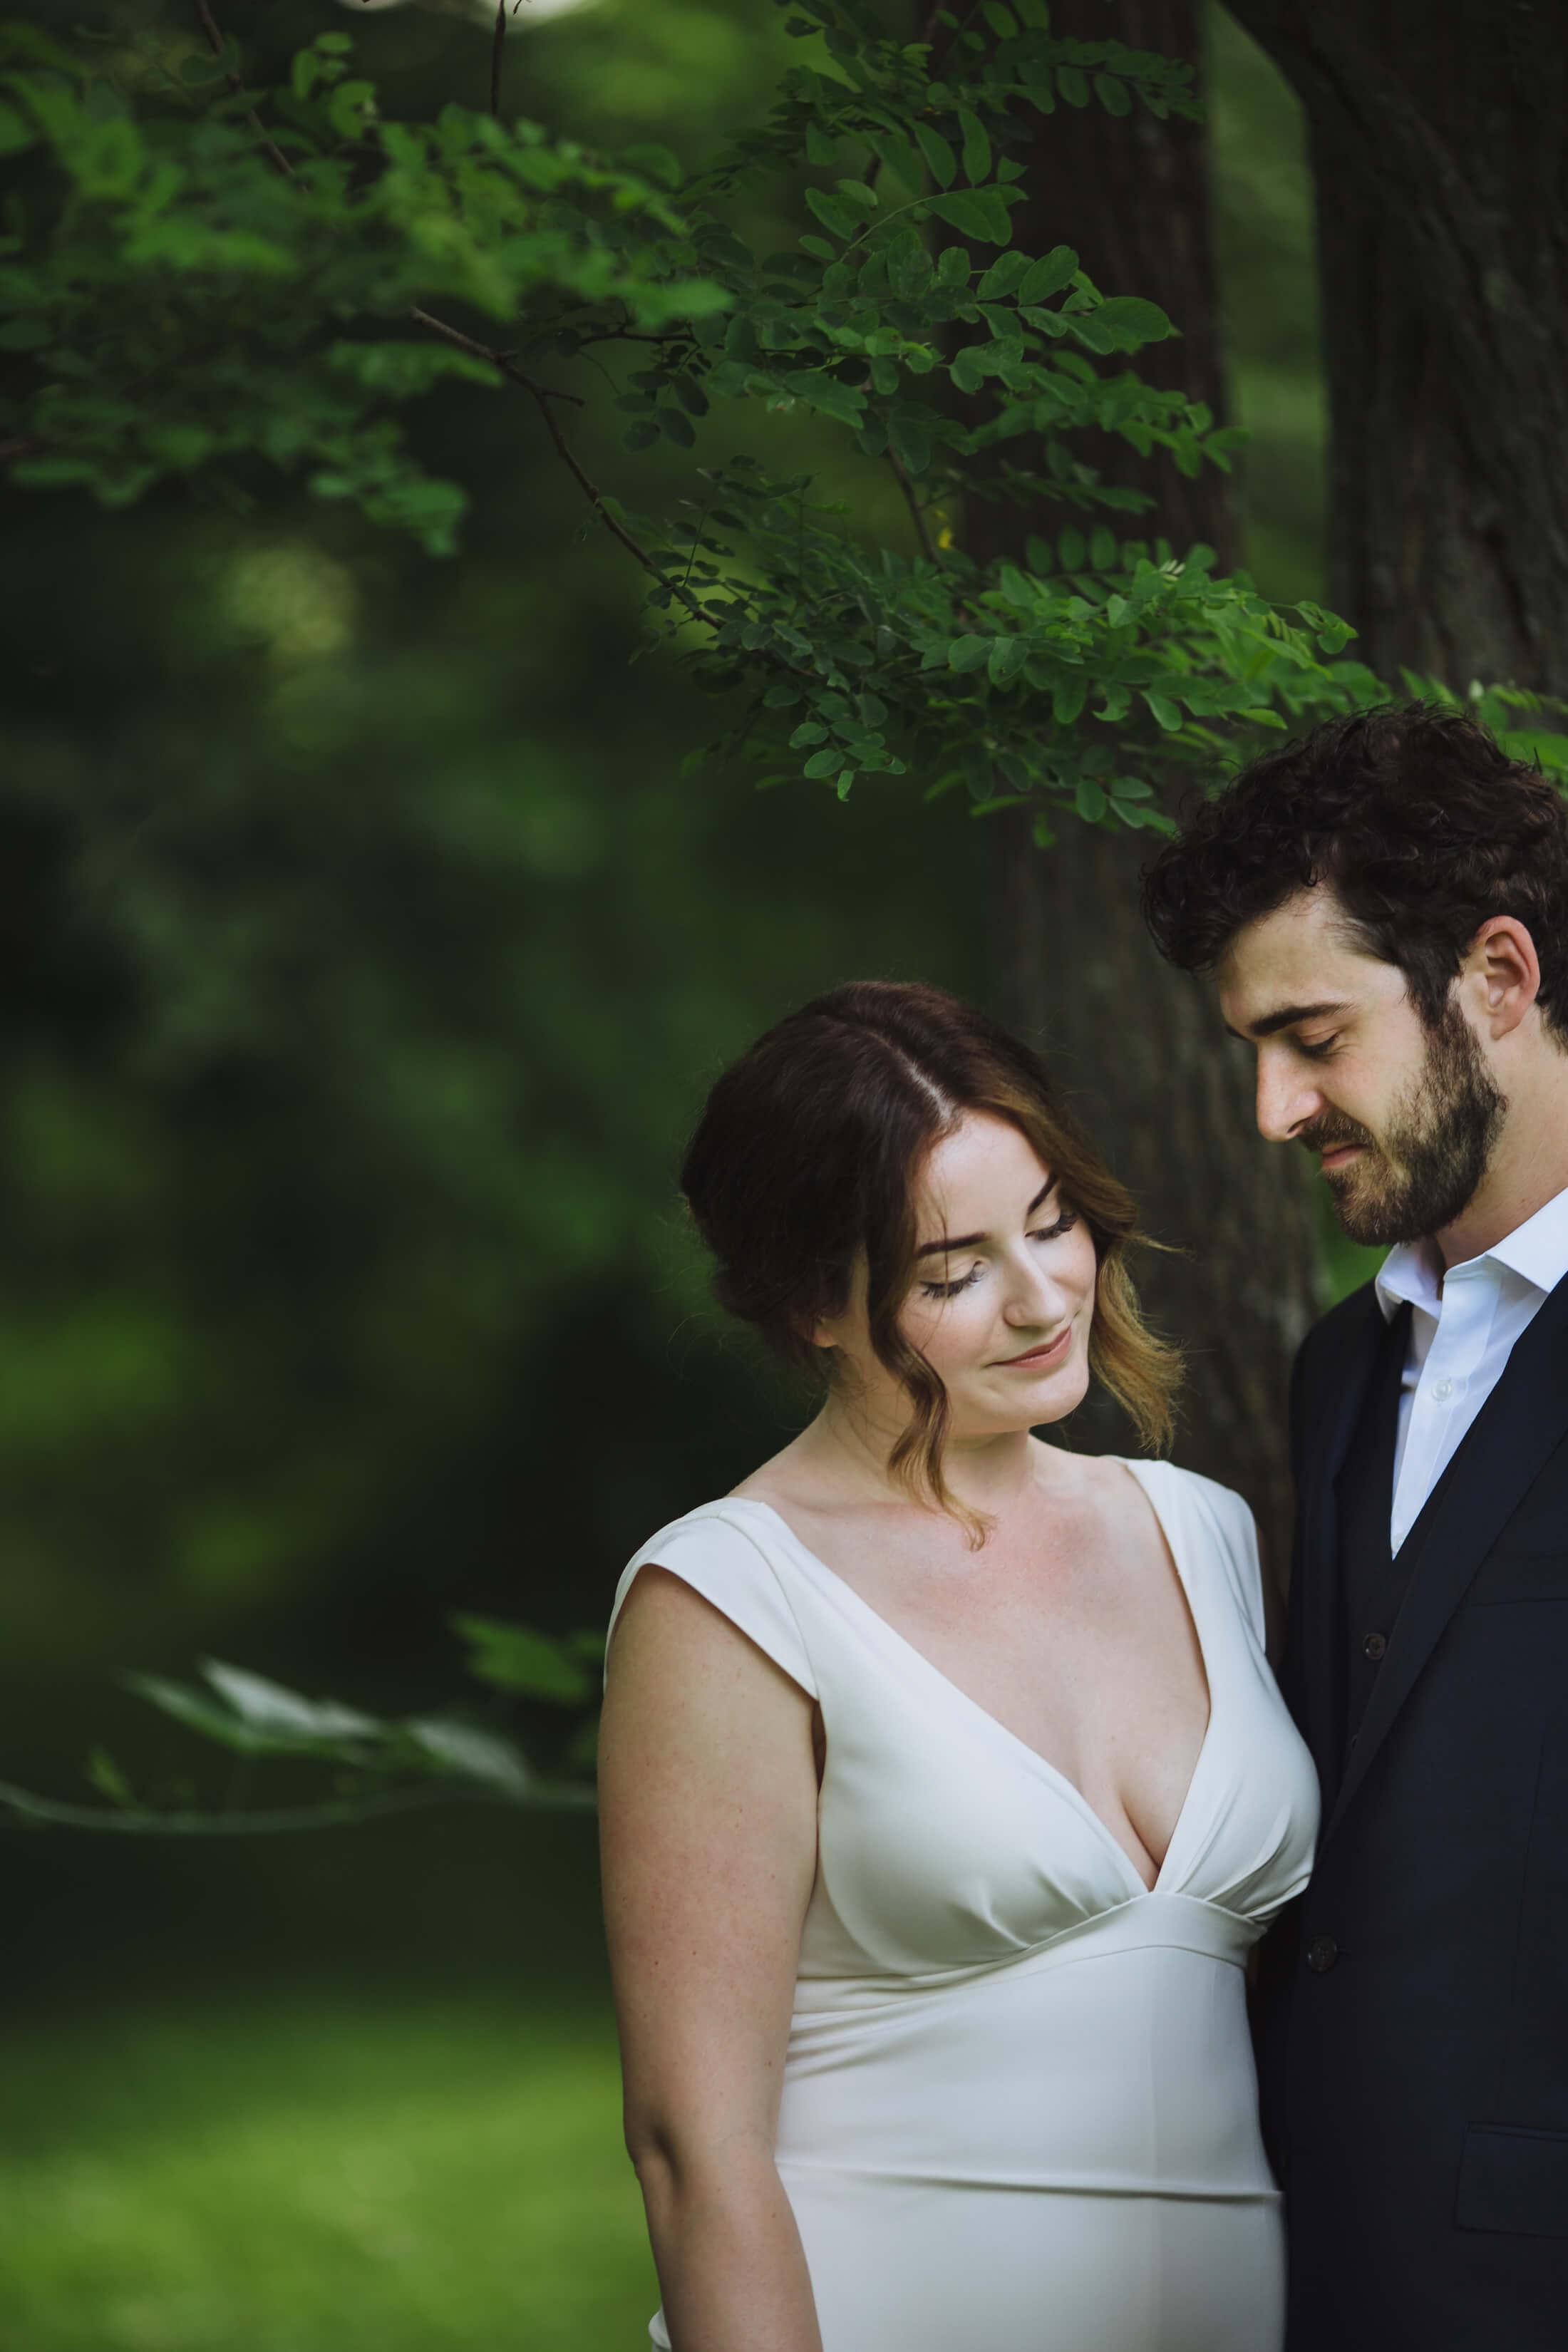 engle-olson-ray-kelly-photography-wisconsin-wedding-29.jpg